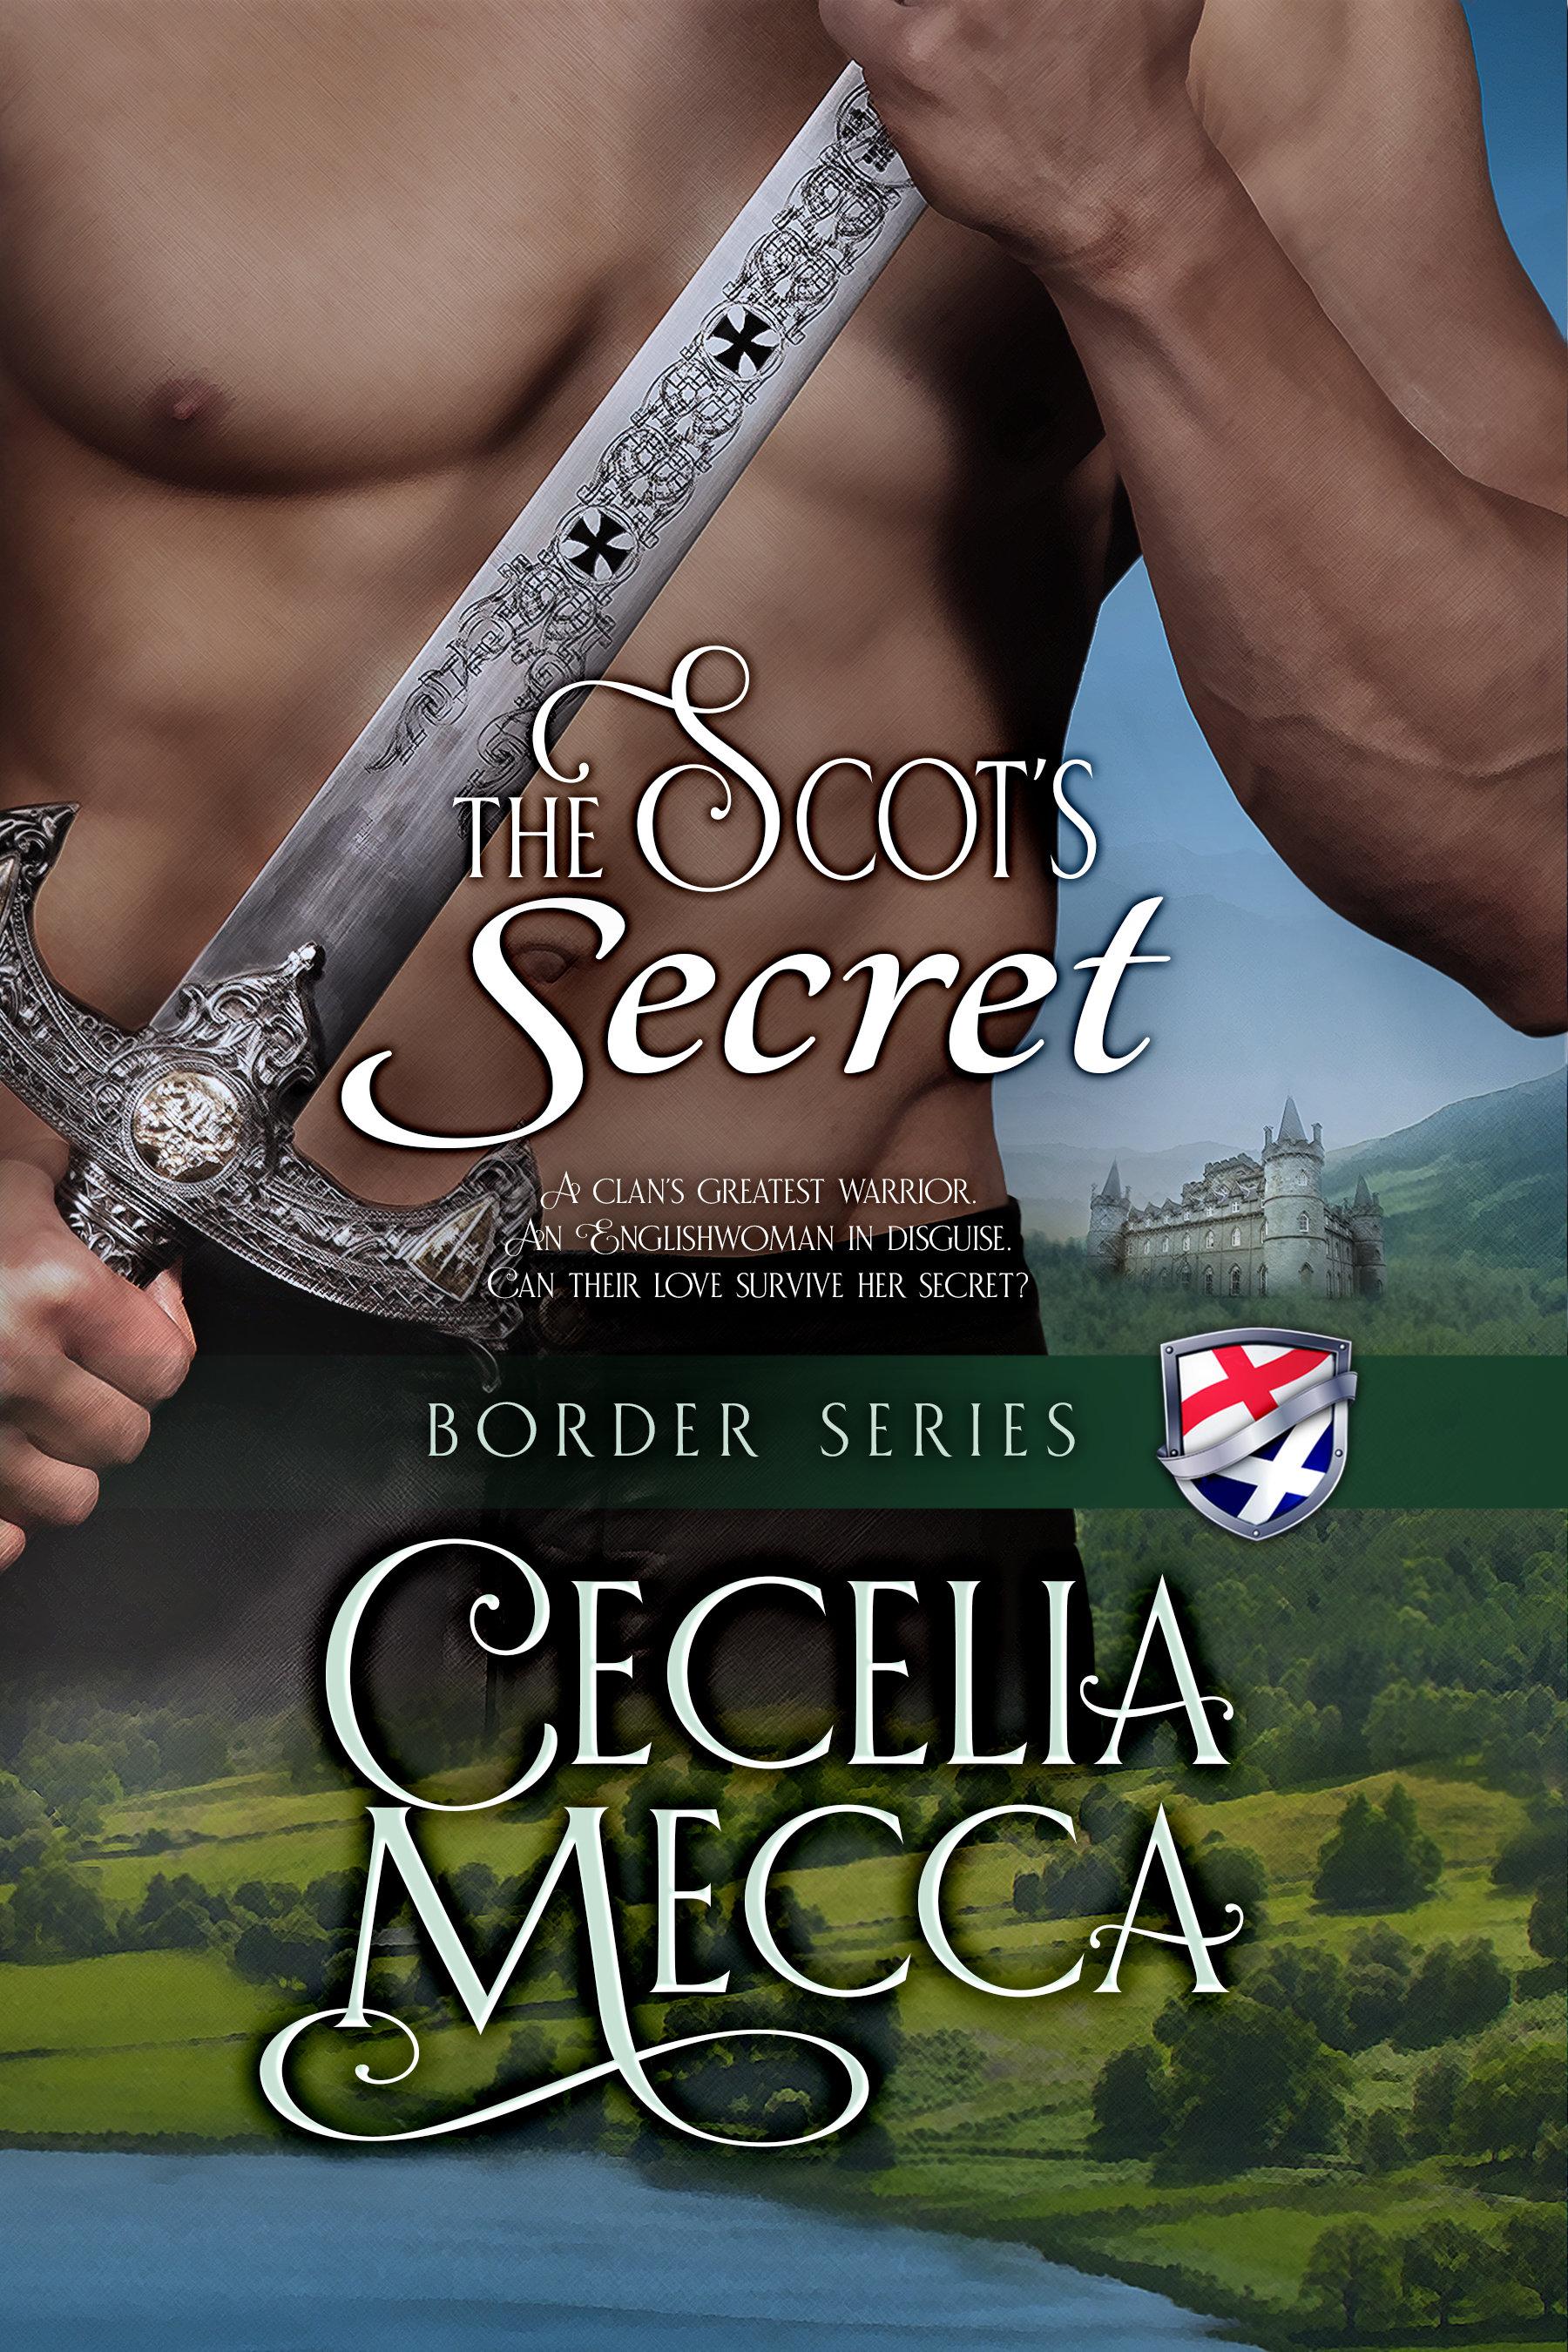 The Scot's Secret: Border Series Book 4 00005